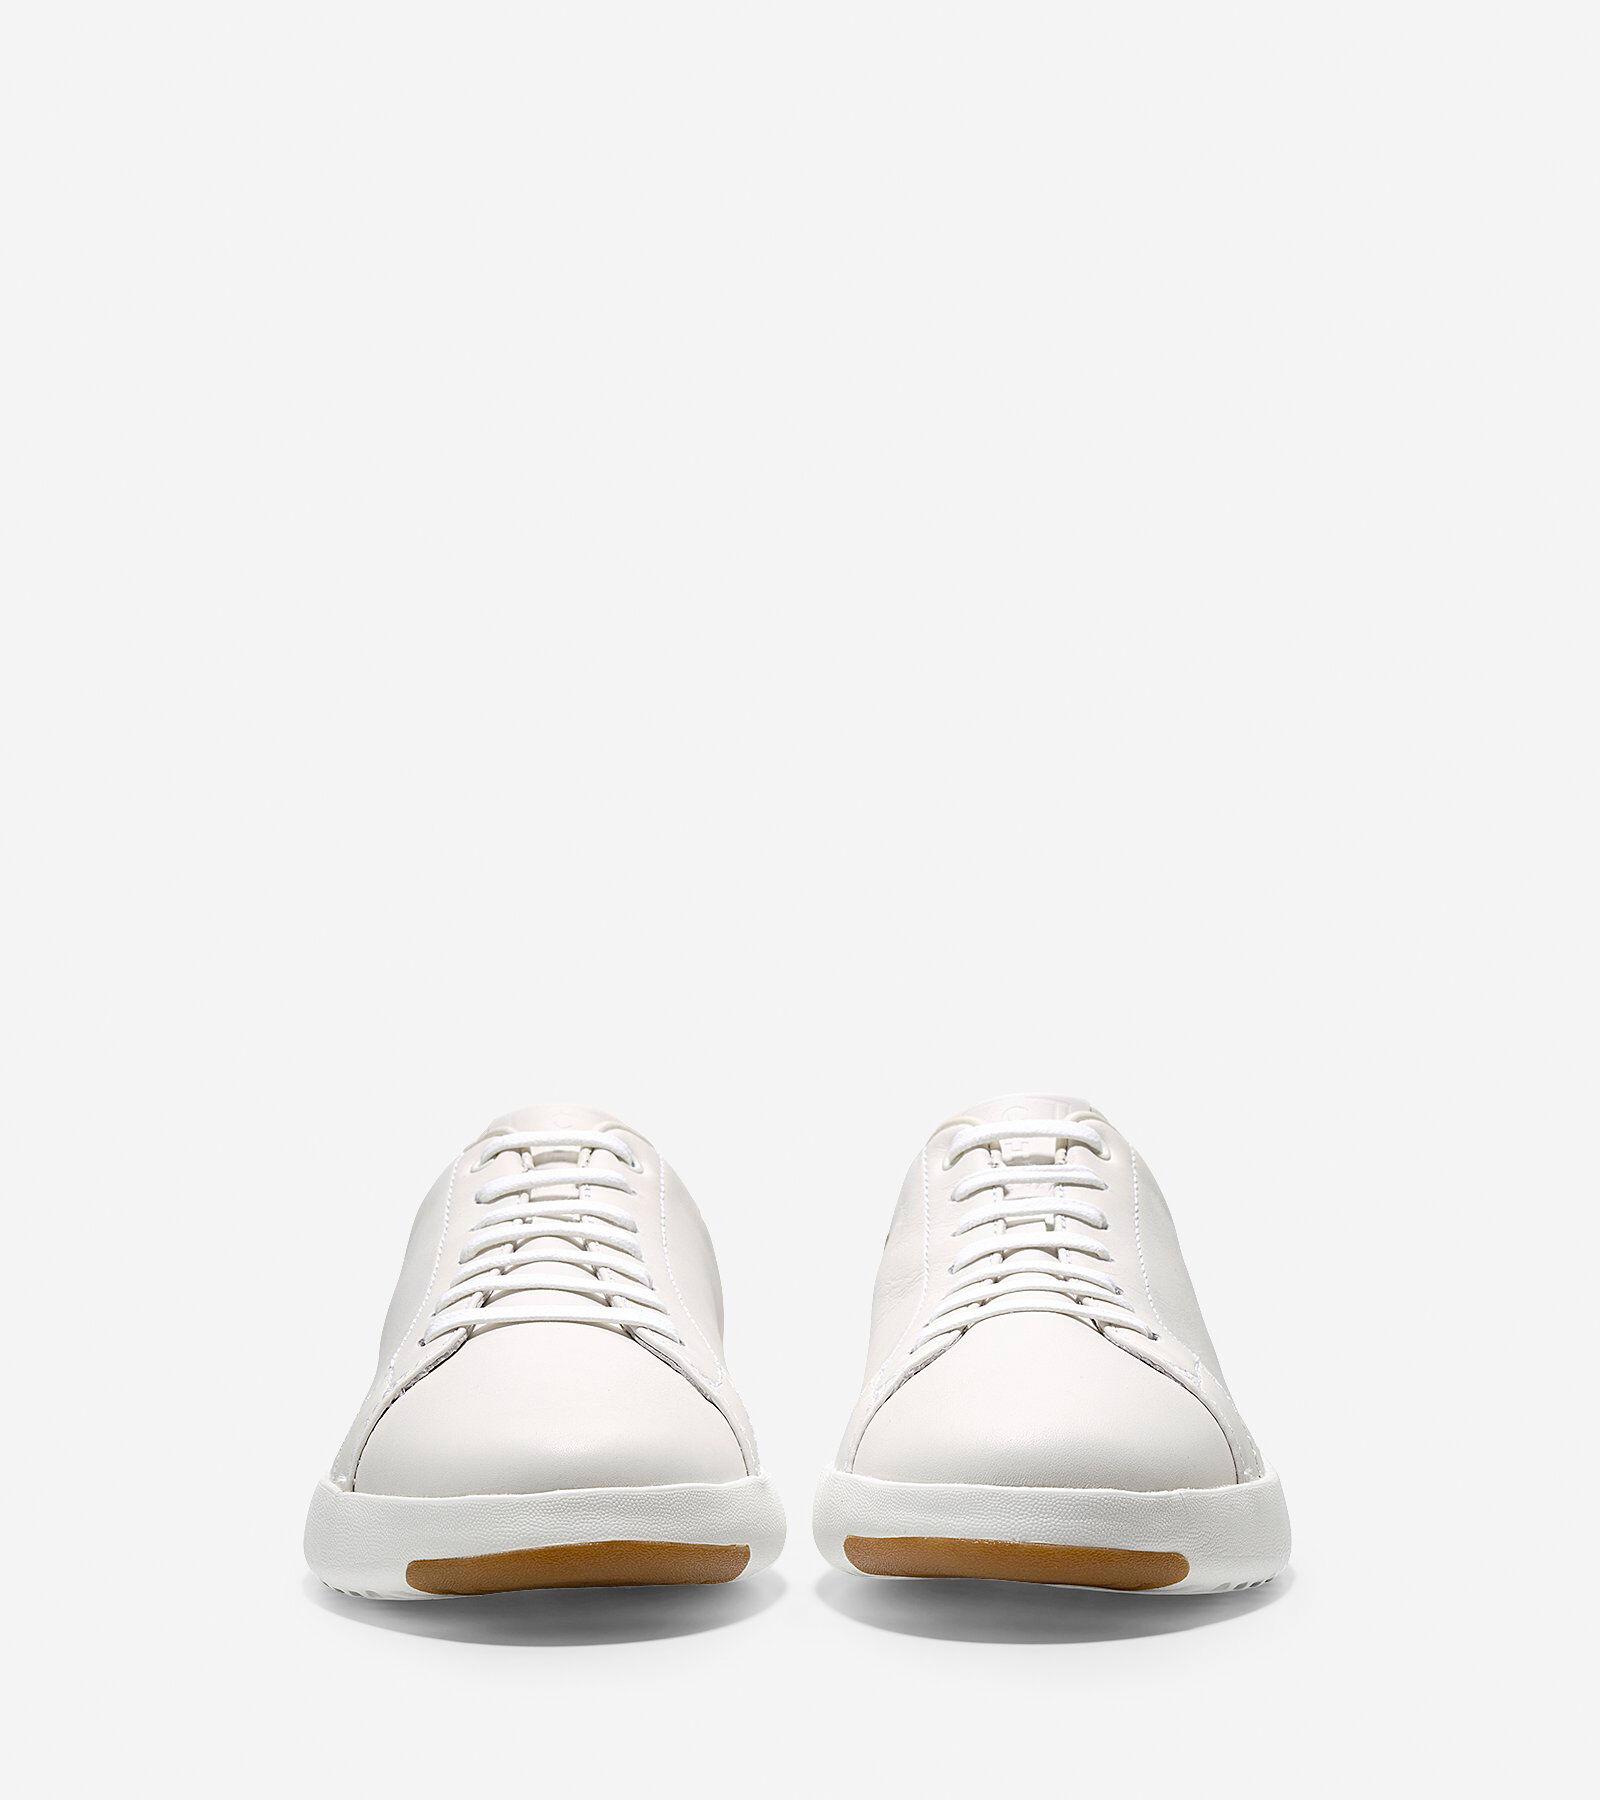 Mens GrandPro Tennis Sneakers in White